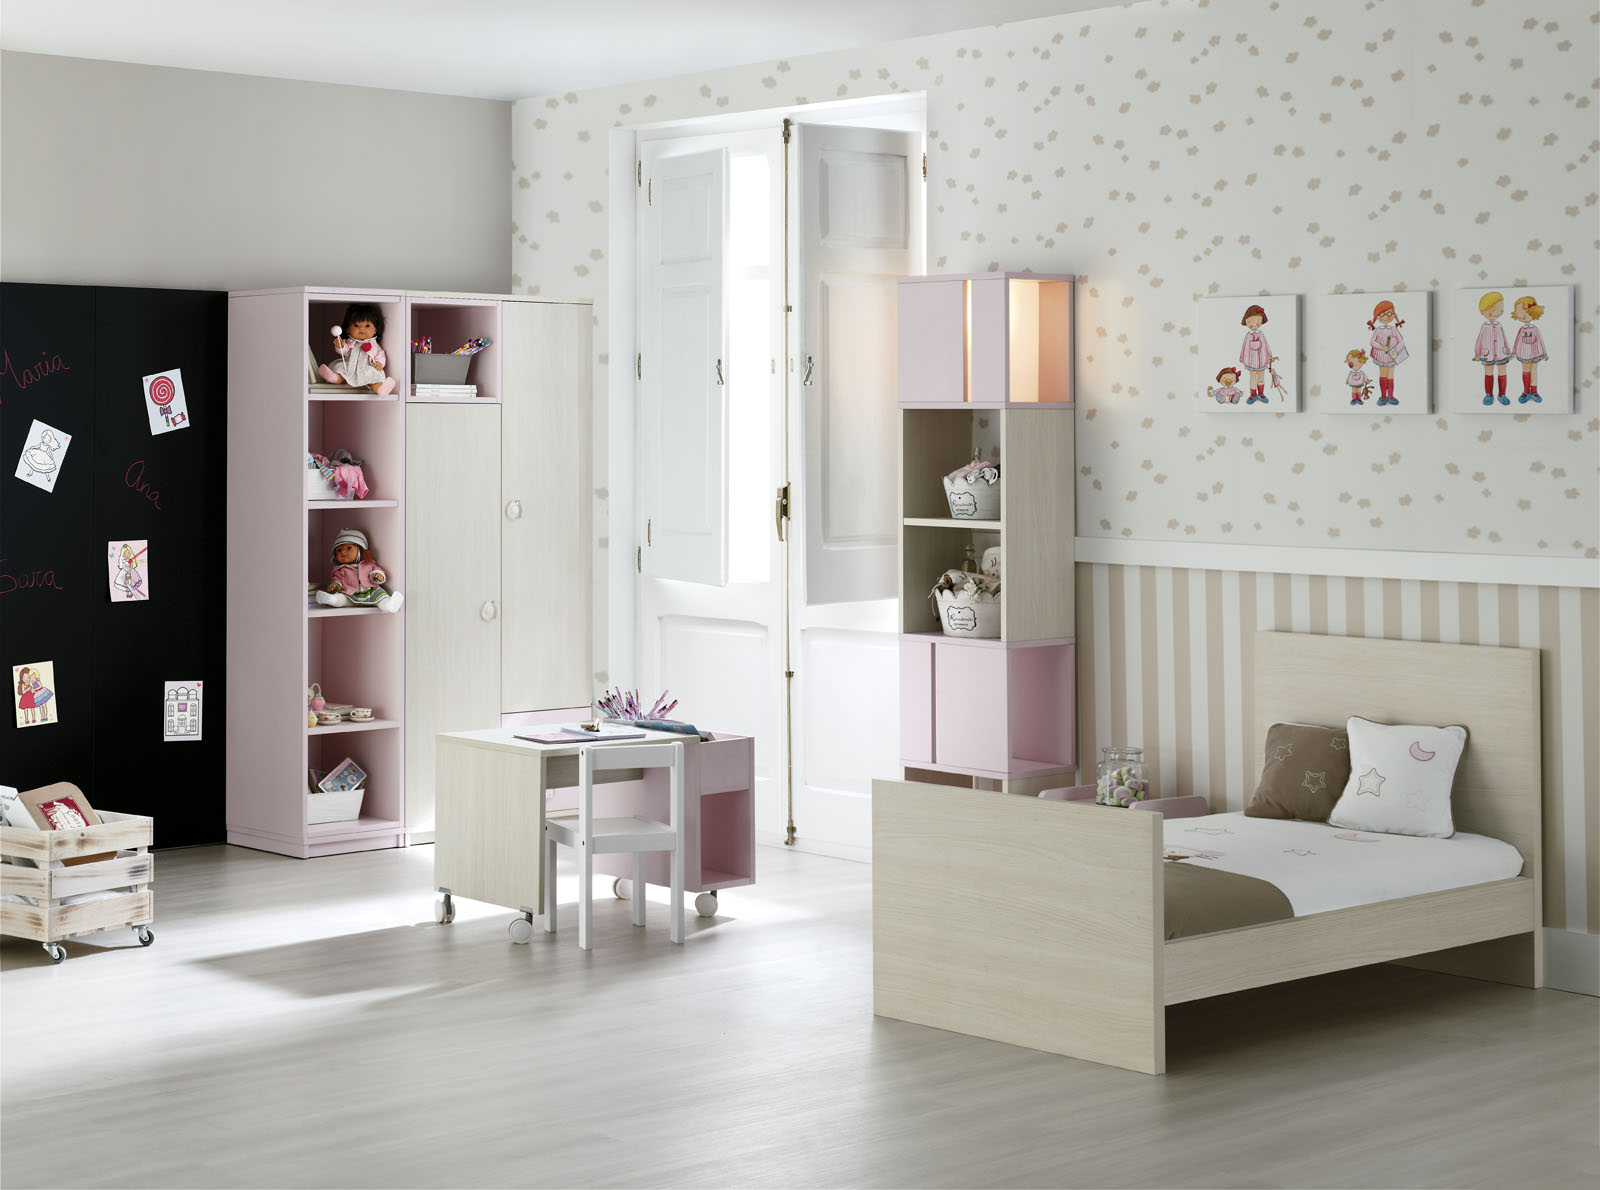 mobilier enfant et junior du berceau au lit d enfant. Black Bedroom Furniture Sets. Home Design Ideas